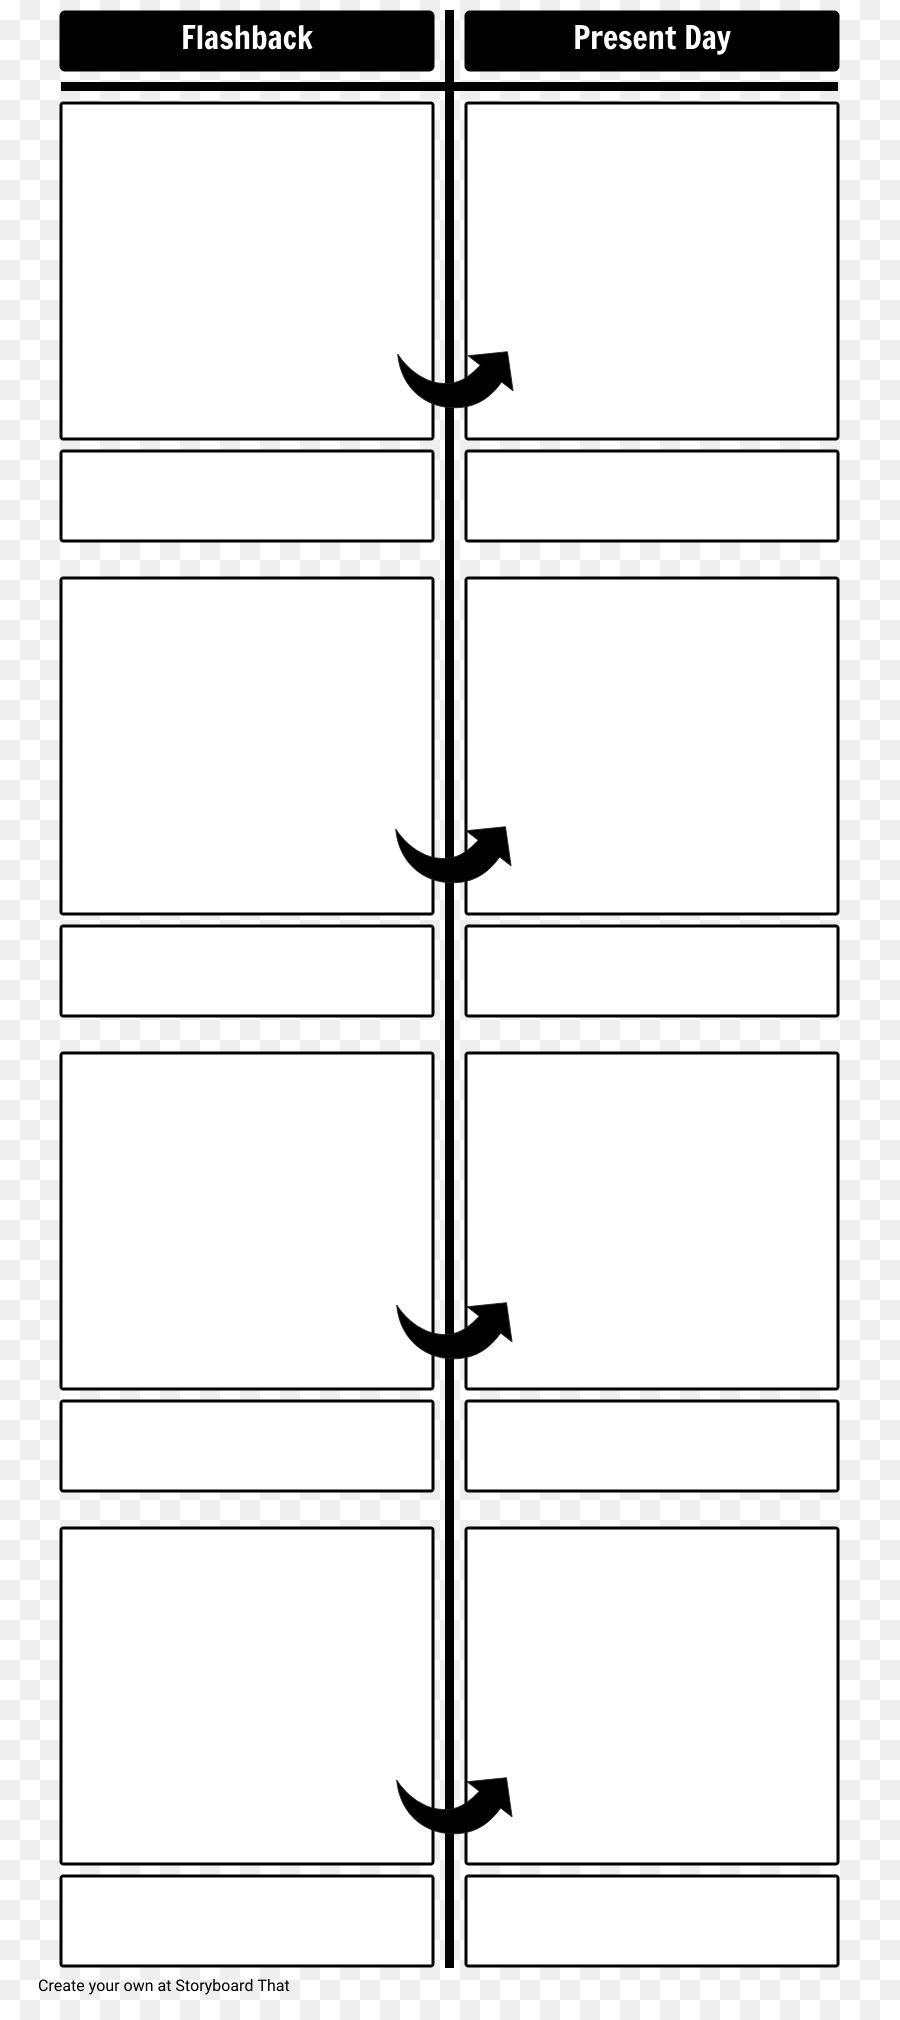 Narrative Structure Plot Literature Flashback Png Download 843